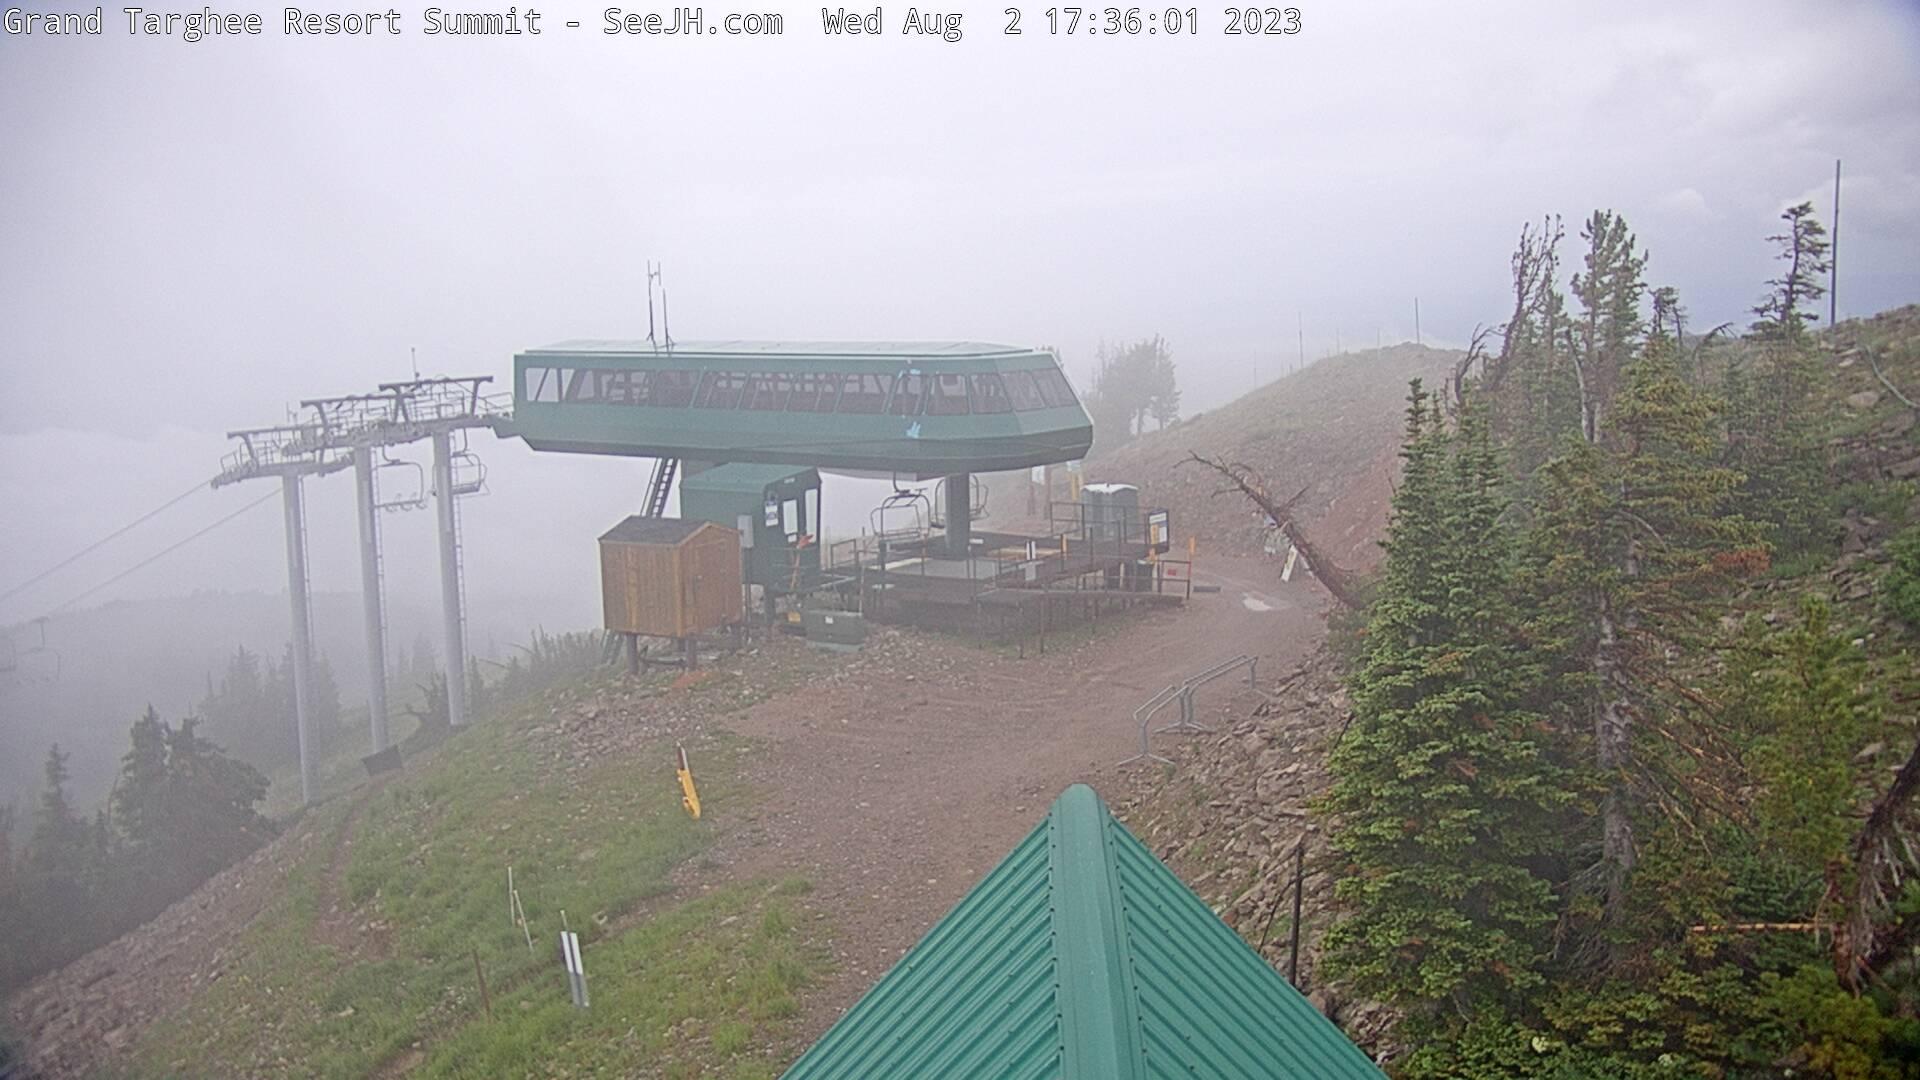 Grand Targhee Ski Area Webcam Image